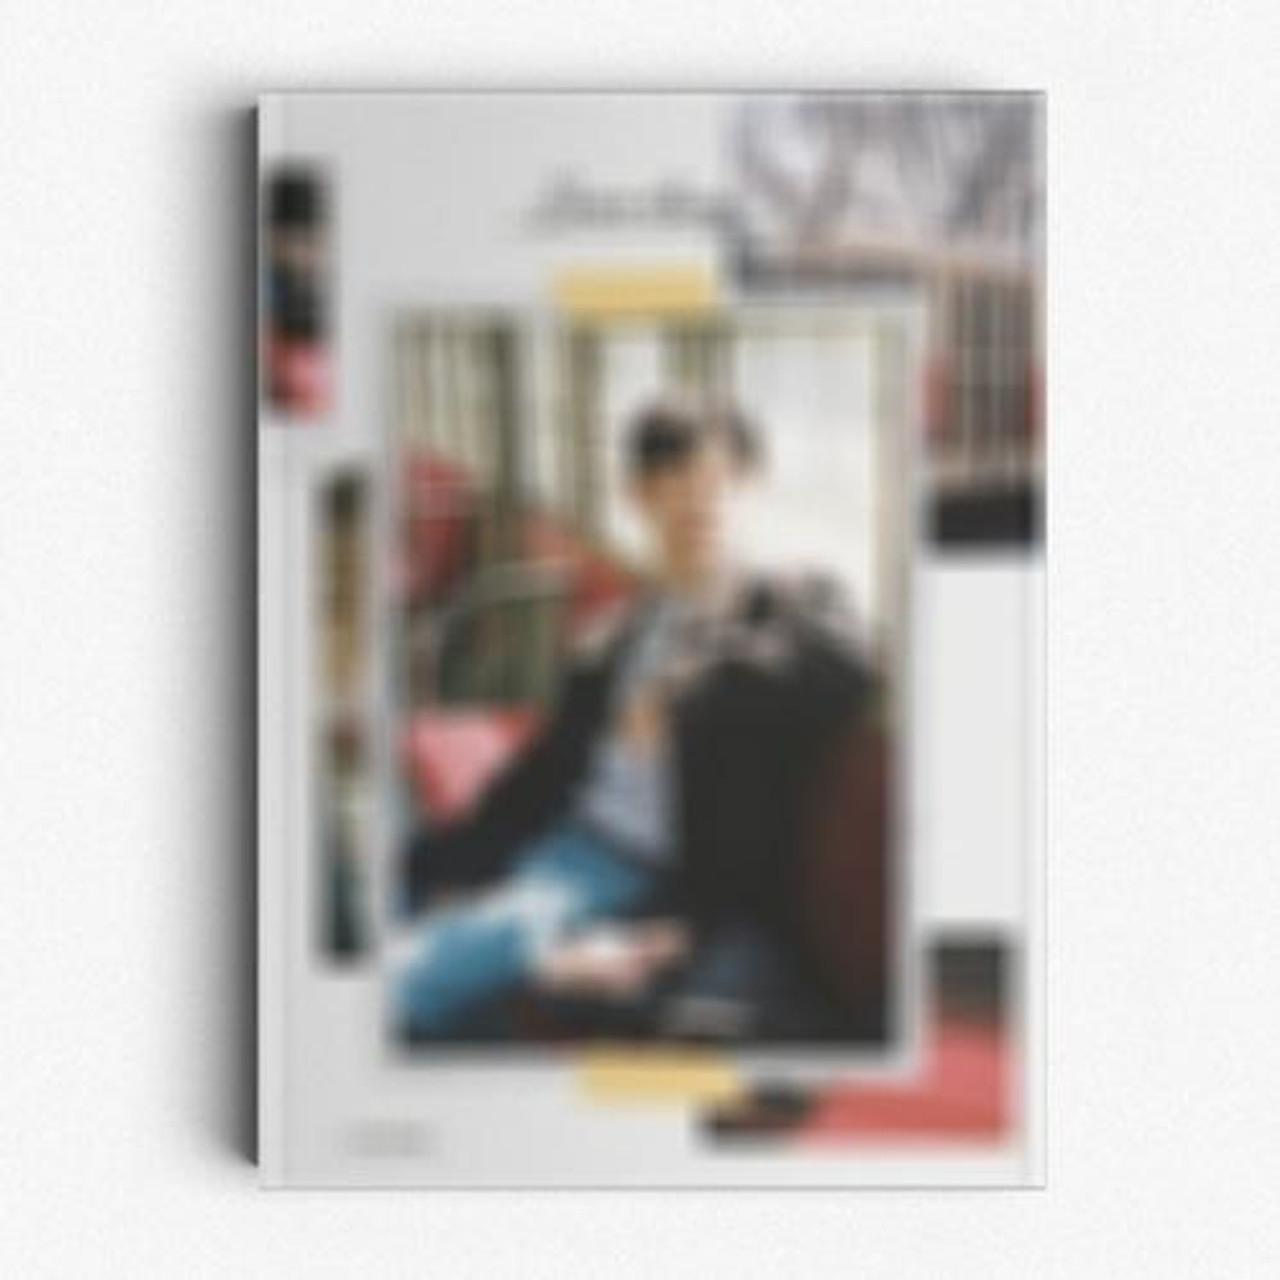 YOON JI SUNG - Special Album [Dear diary] + Poster